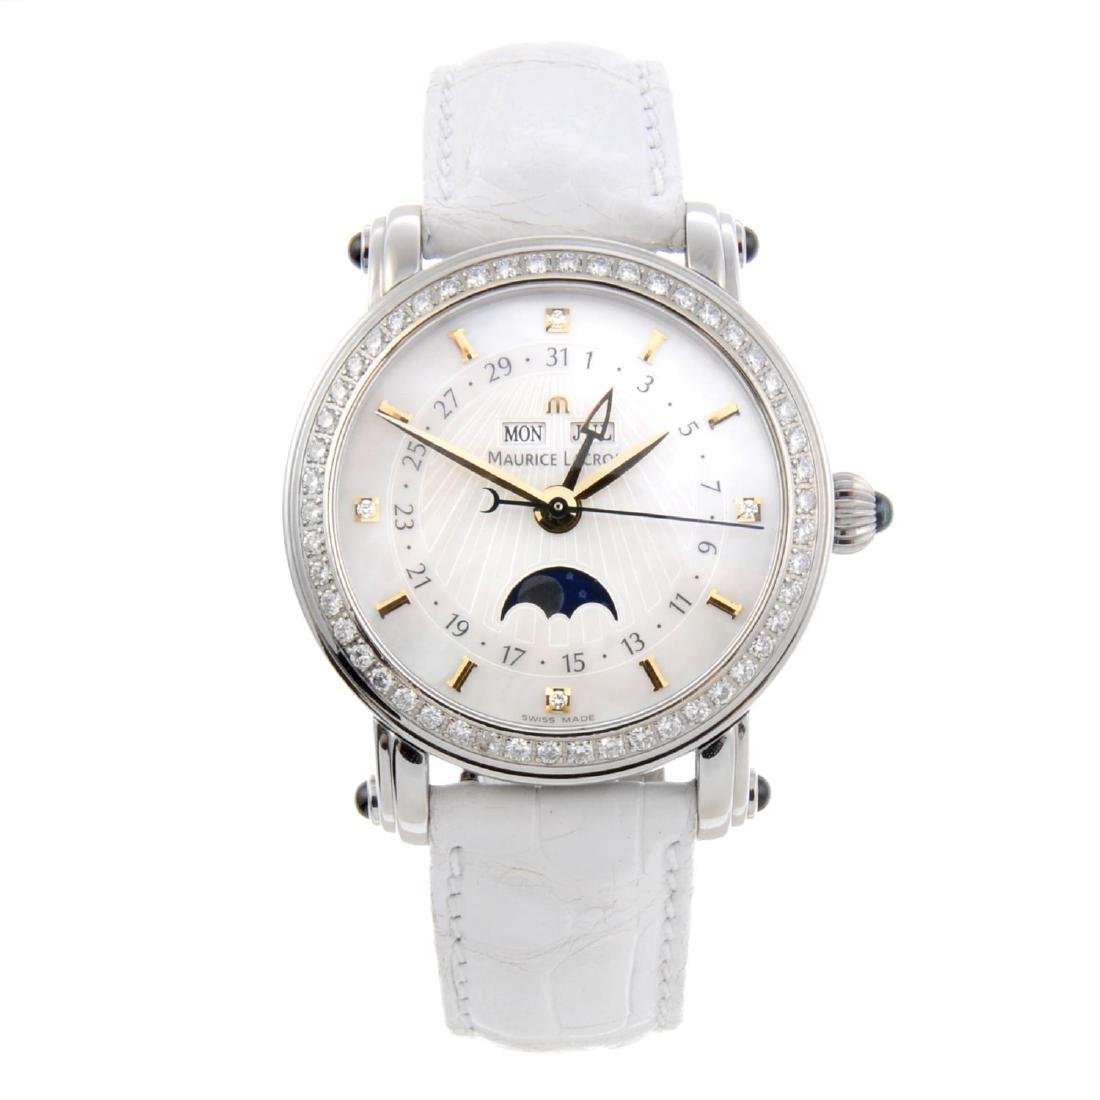 MAURICE LACROIX - a lady's Masterpiece wrist watch.